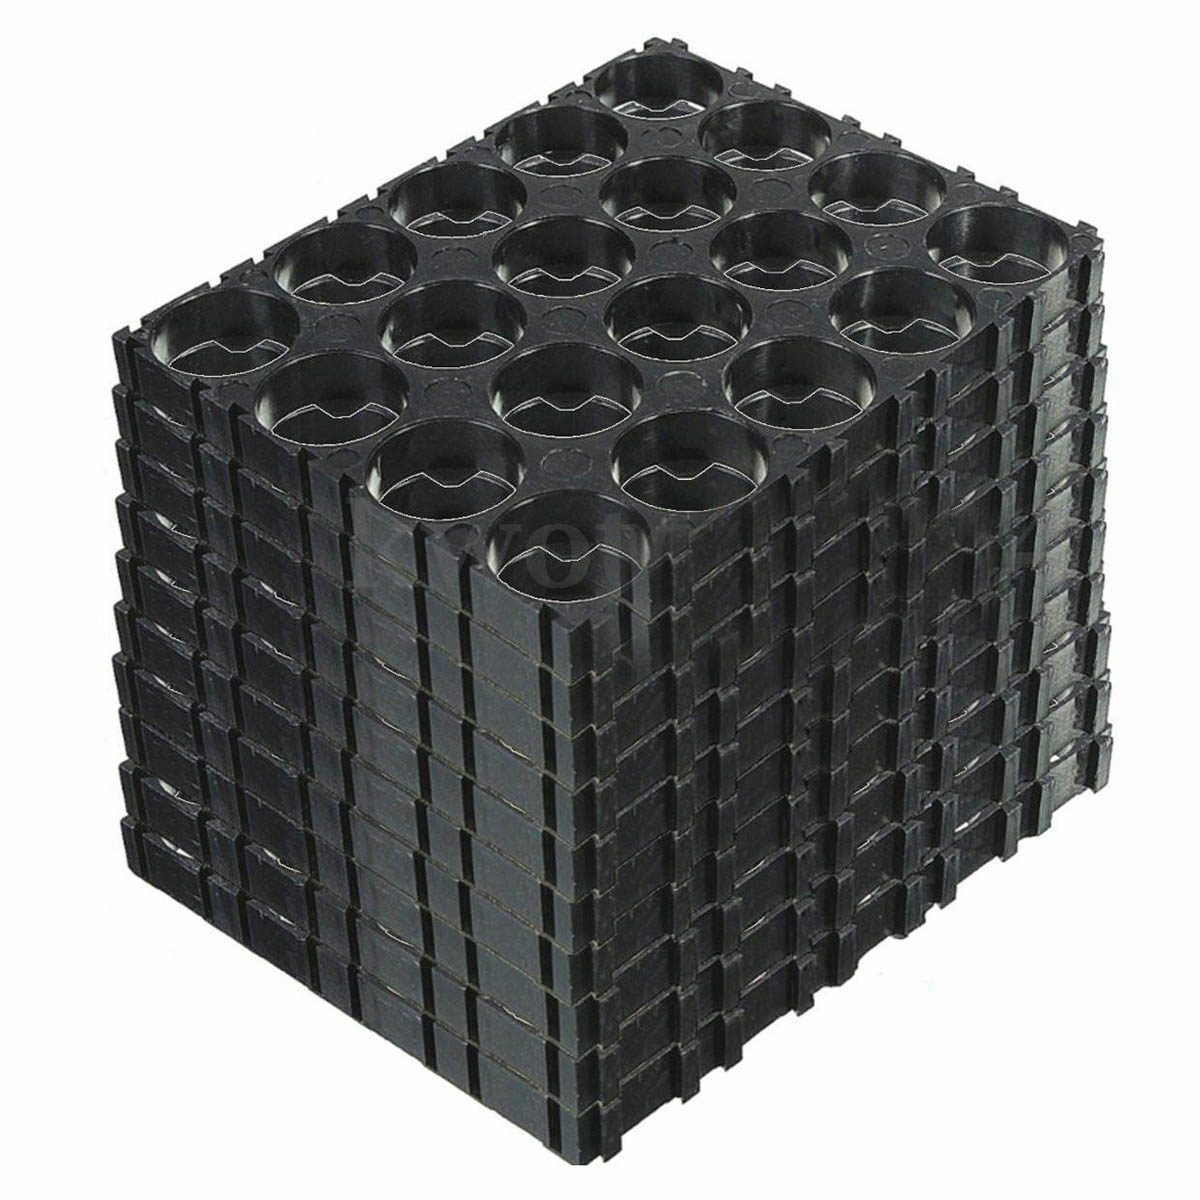 10PC 18650 Battery 4x5 Cell Spacer Radiating Shell Plastic Holder Bracket O7W1